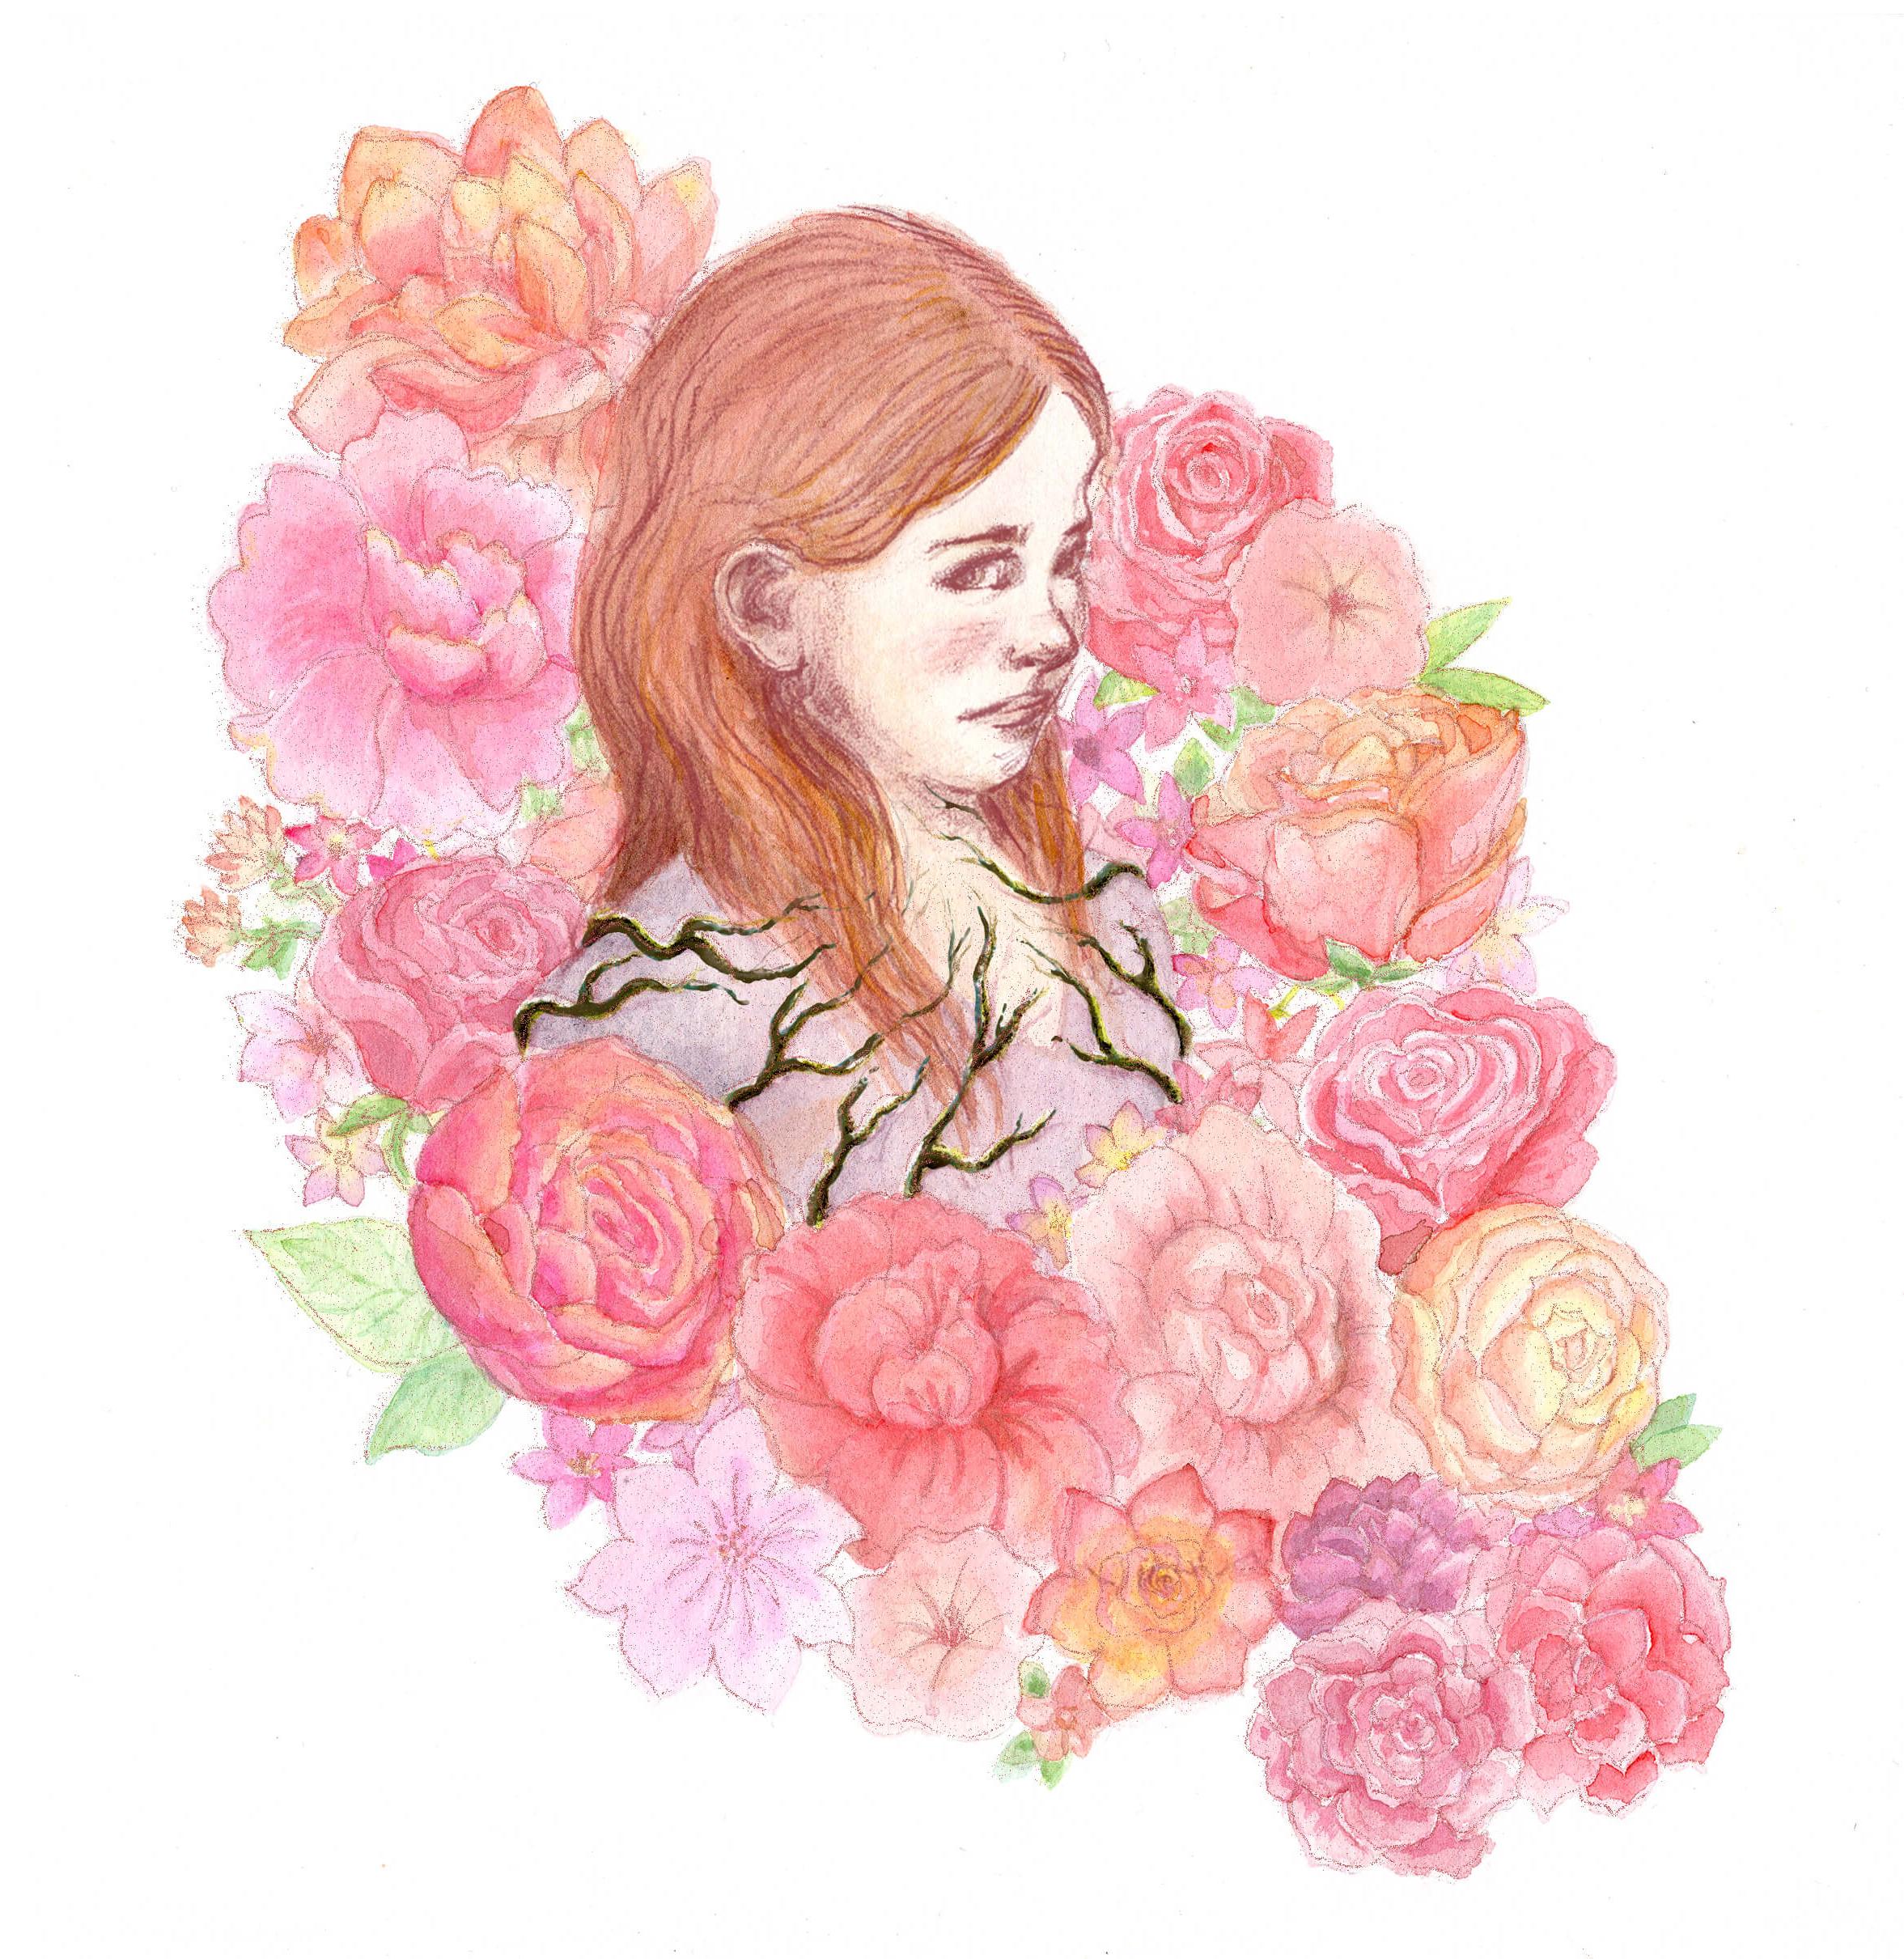 cora-marinoff-illustration-thesis-editorial-femininity